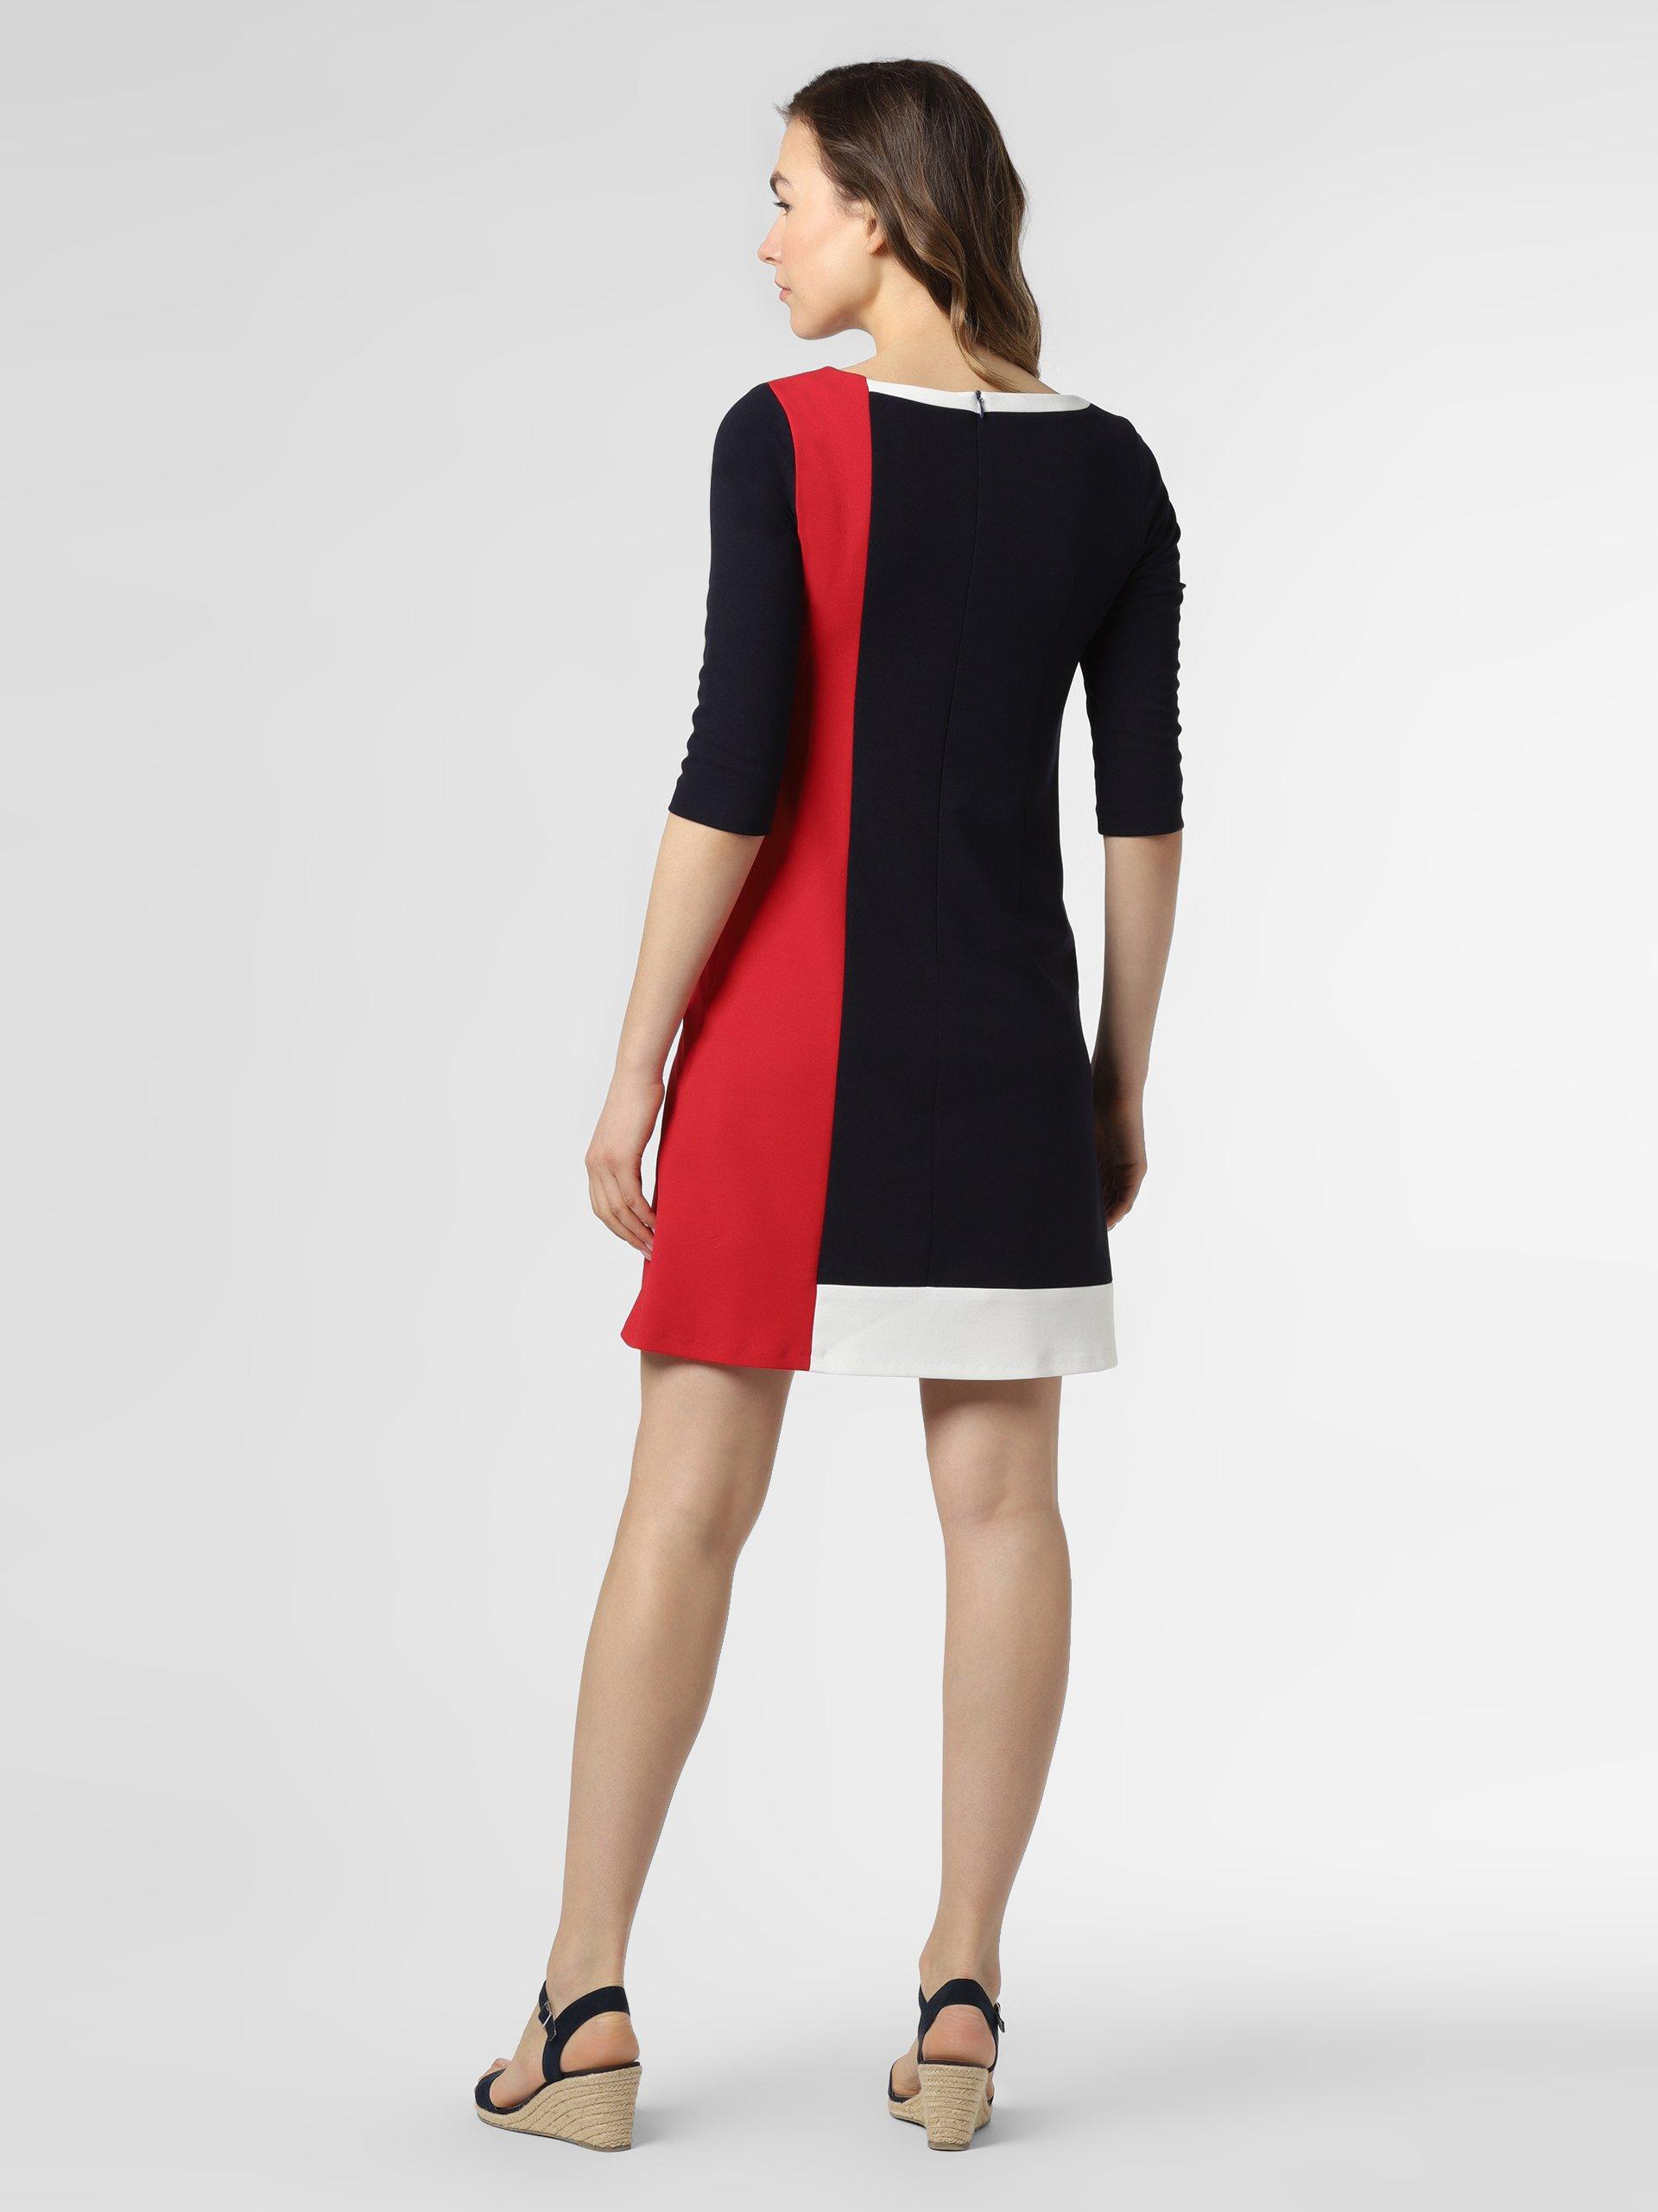 paradi damen kleid online kaufen  peekundcloppenburgde